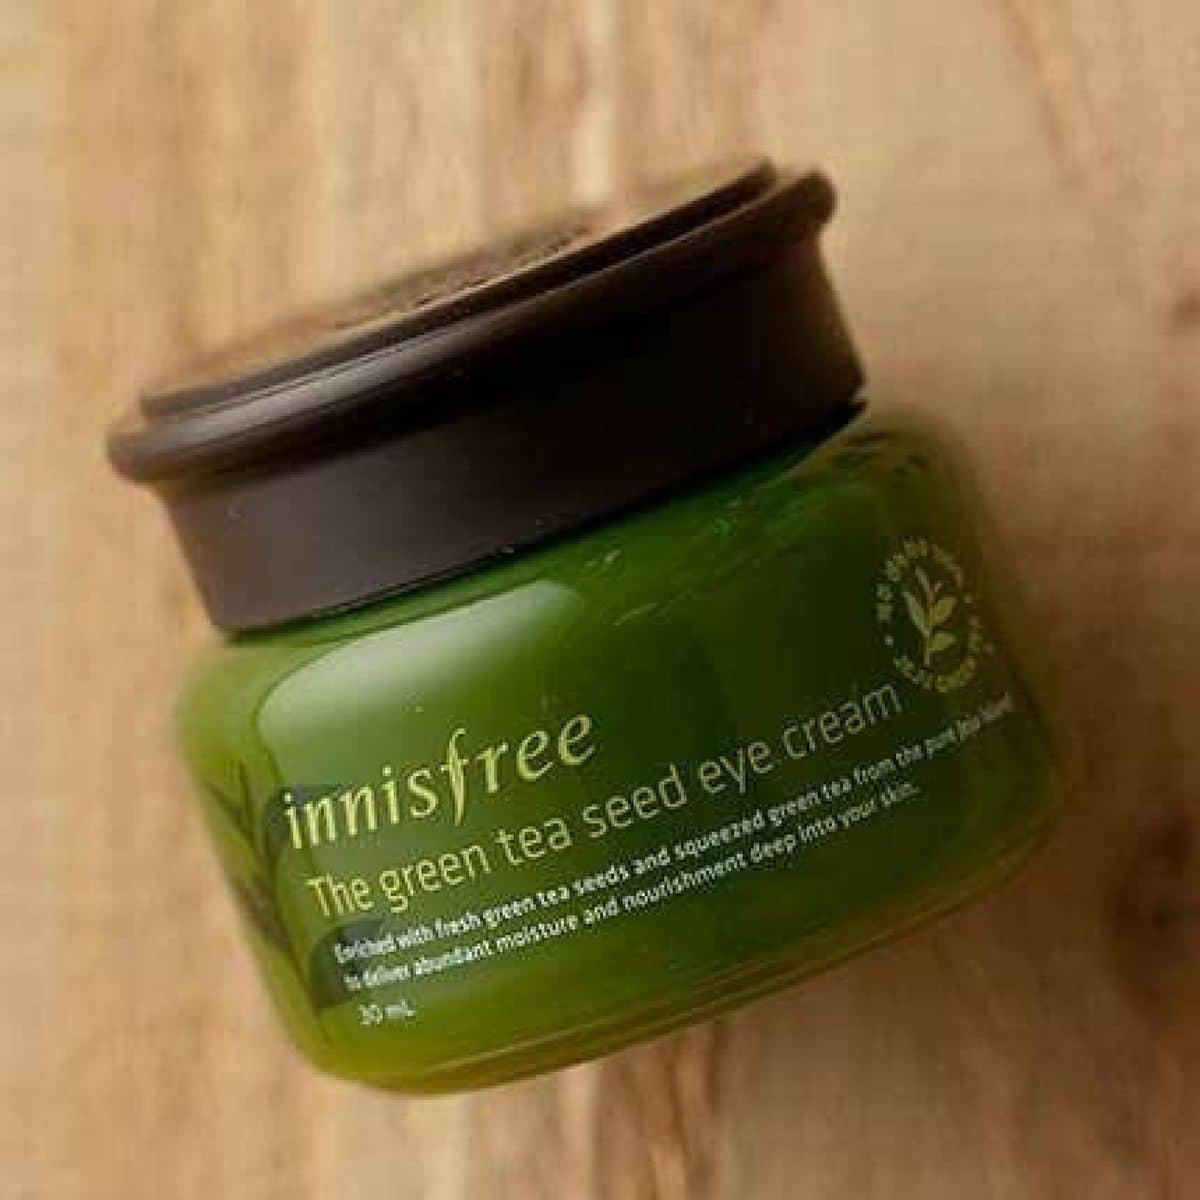 Kem Dng Dnh Cho Mt Innisfree The Green Tea Seed Eye Cream Ti 617 2 L Hng Phong Ca Keyheo Lozi